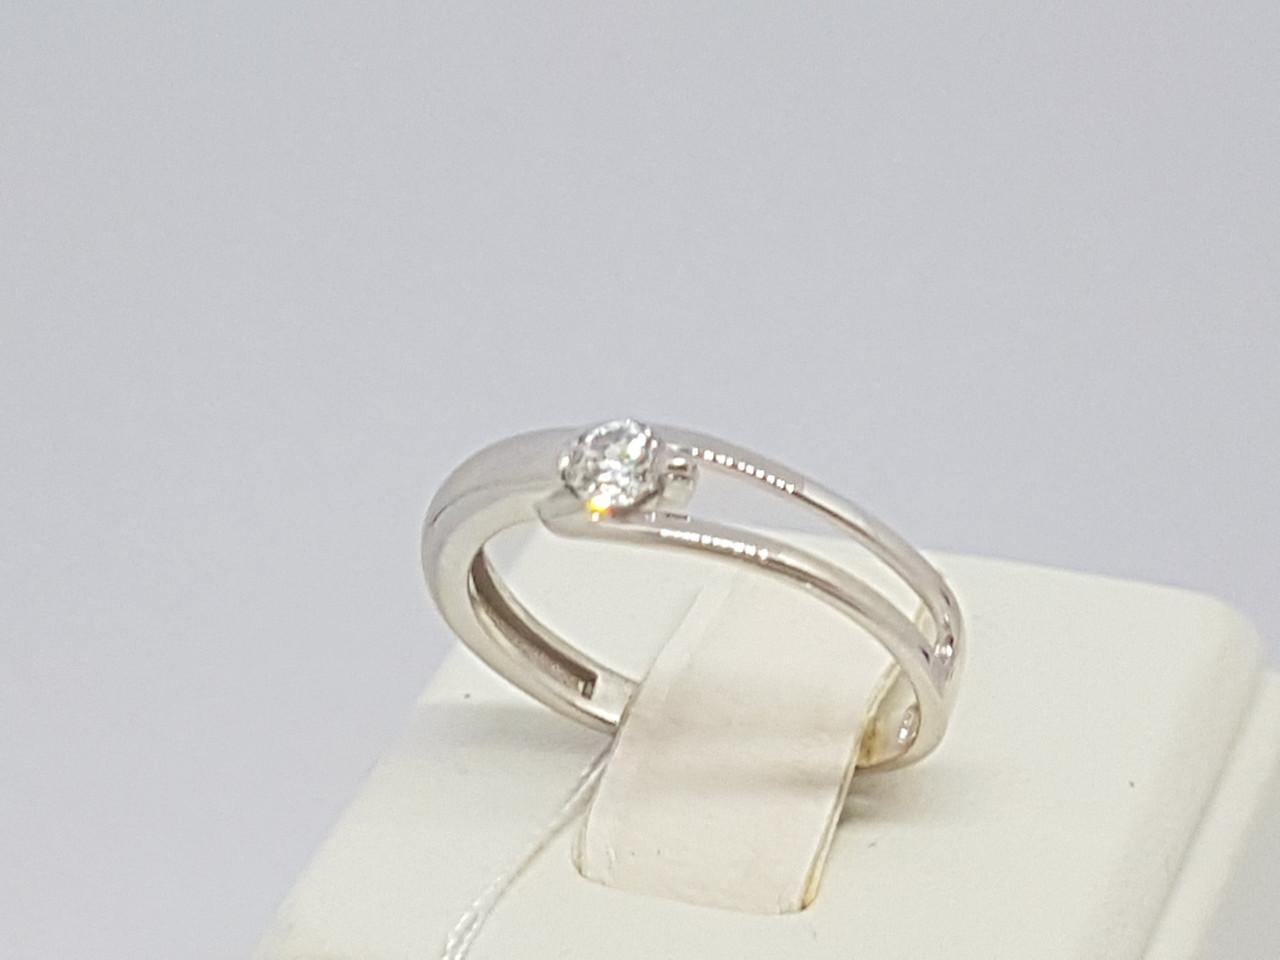 Серебряное кольцо с фианитом. Артикул 19028р